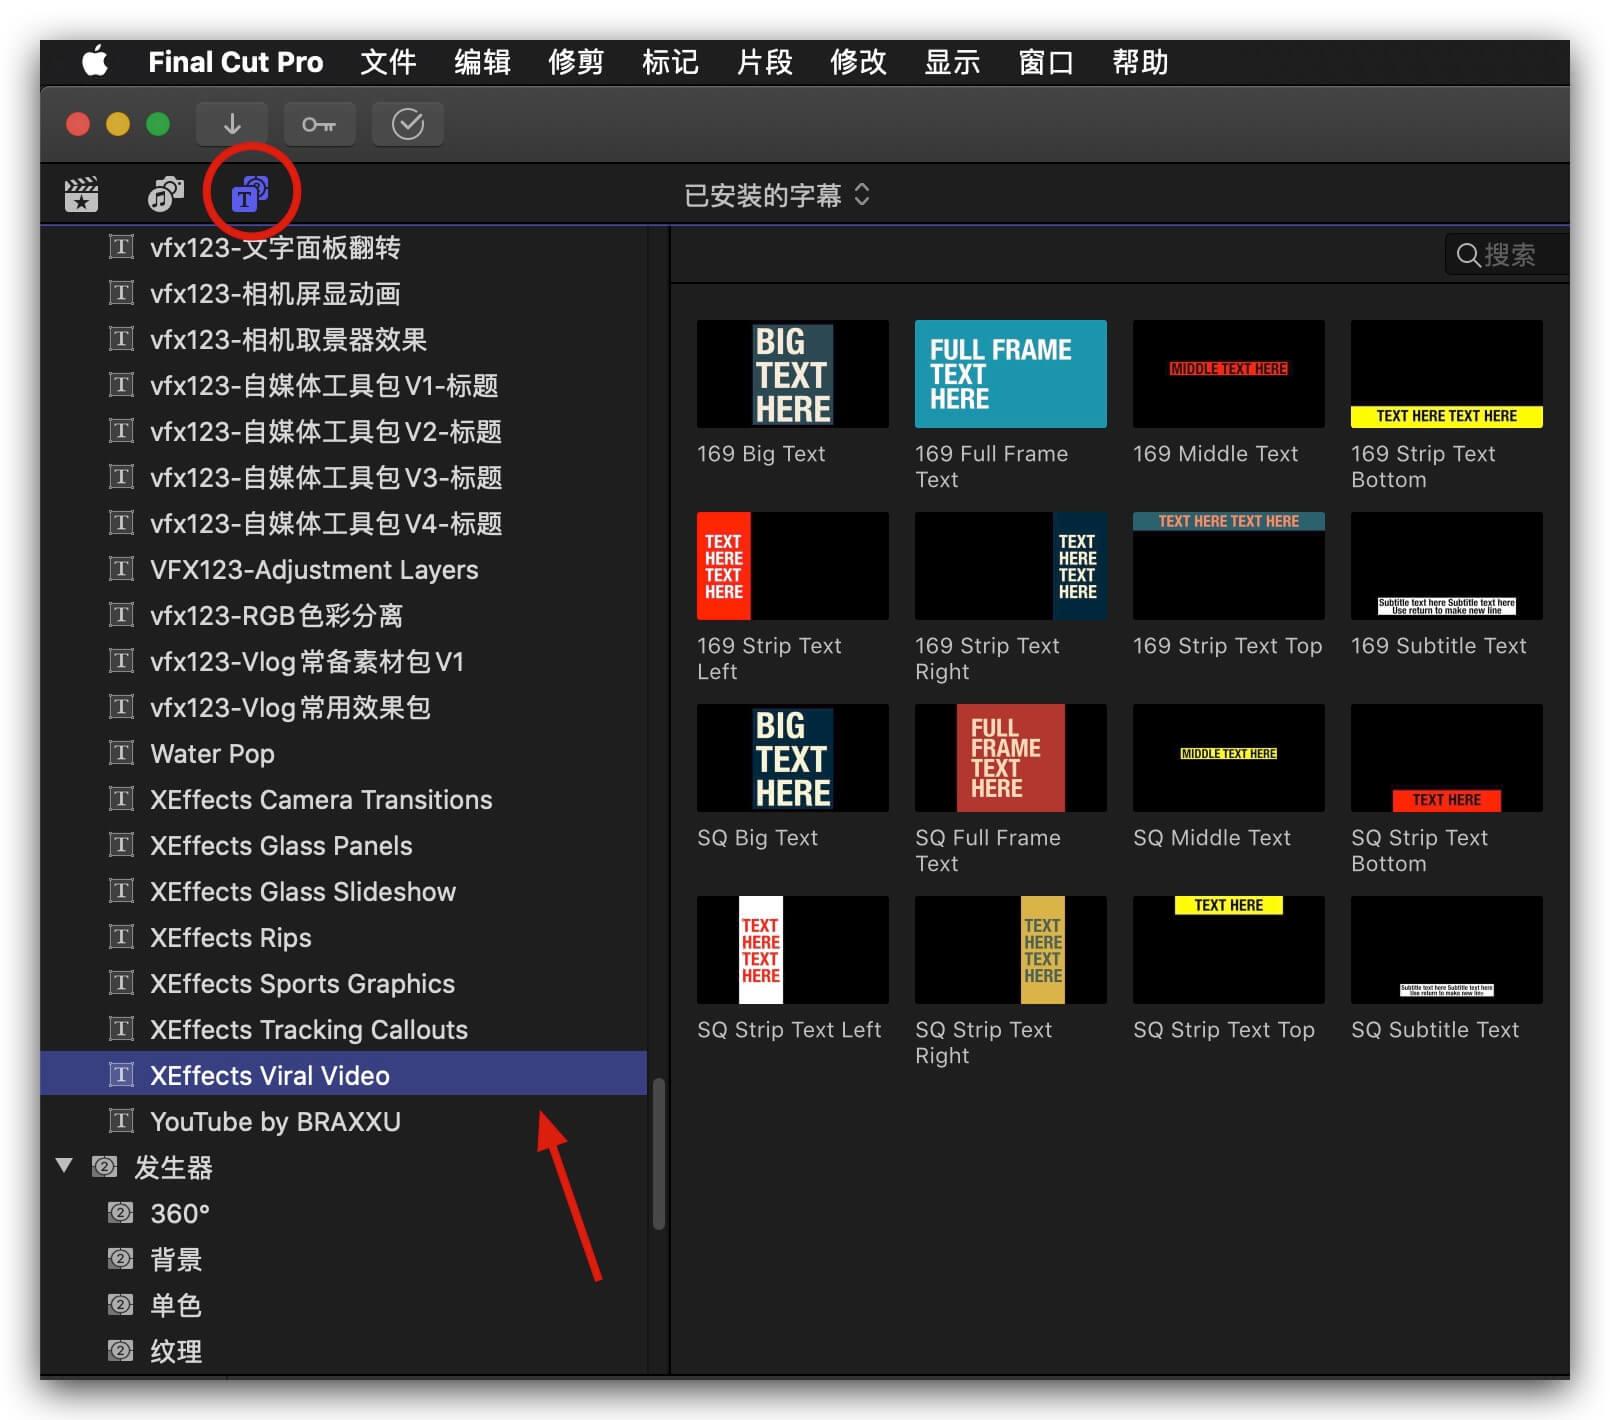 fcpx插件 影片添加侧边栏底边栏说明注解动画制作工具 支持M1 XEffects Viral Video